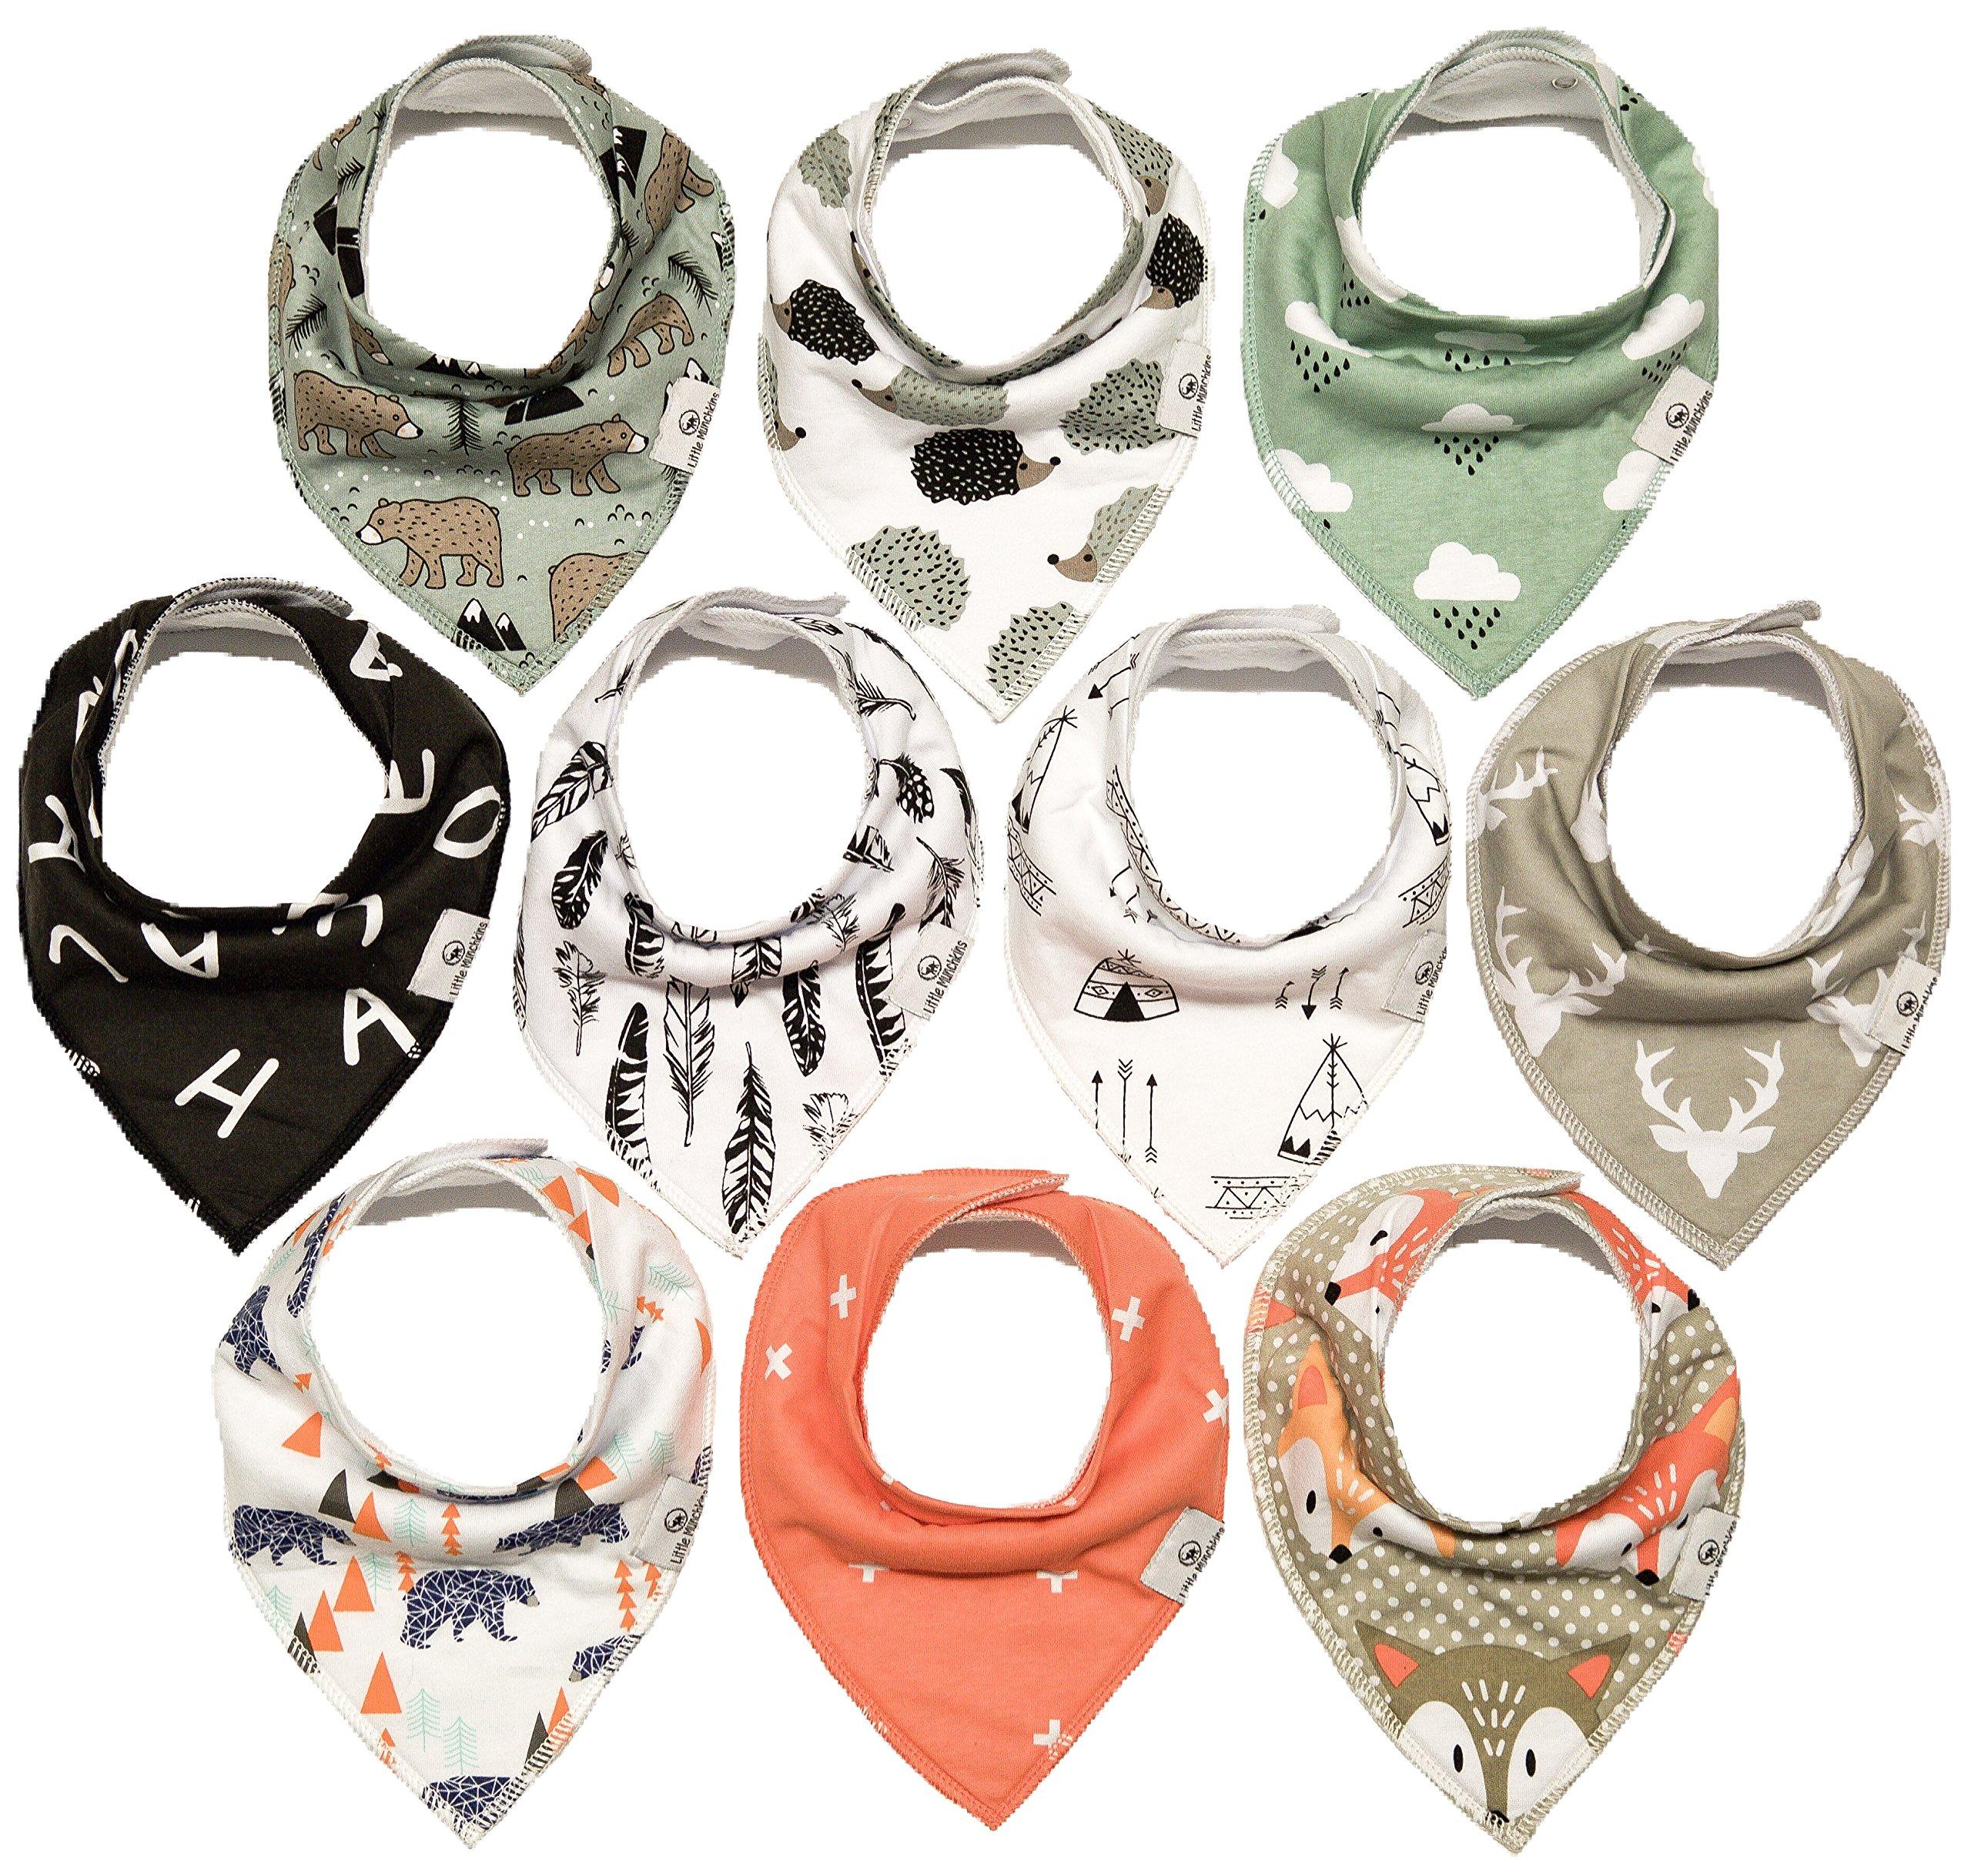 10-Pack Bandana Bibs Little Munchkins Handkerchief Bibs, Baby Drool Bibdanas, Organic Cotton, Super Absorbent, 10 Stylish Designs for Baby Boys Girls Toddler, Adjustable Snaps